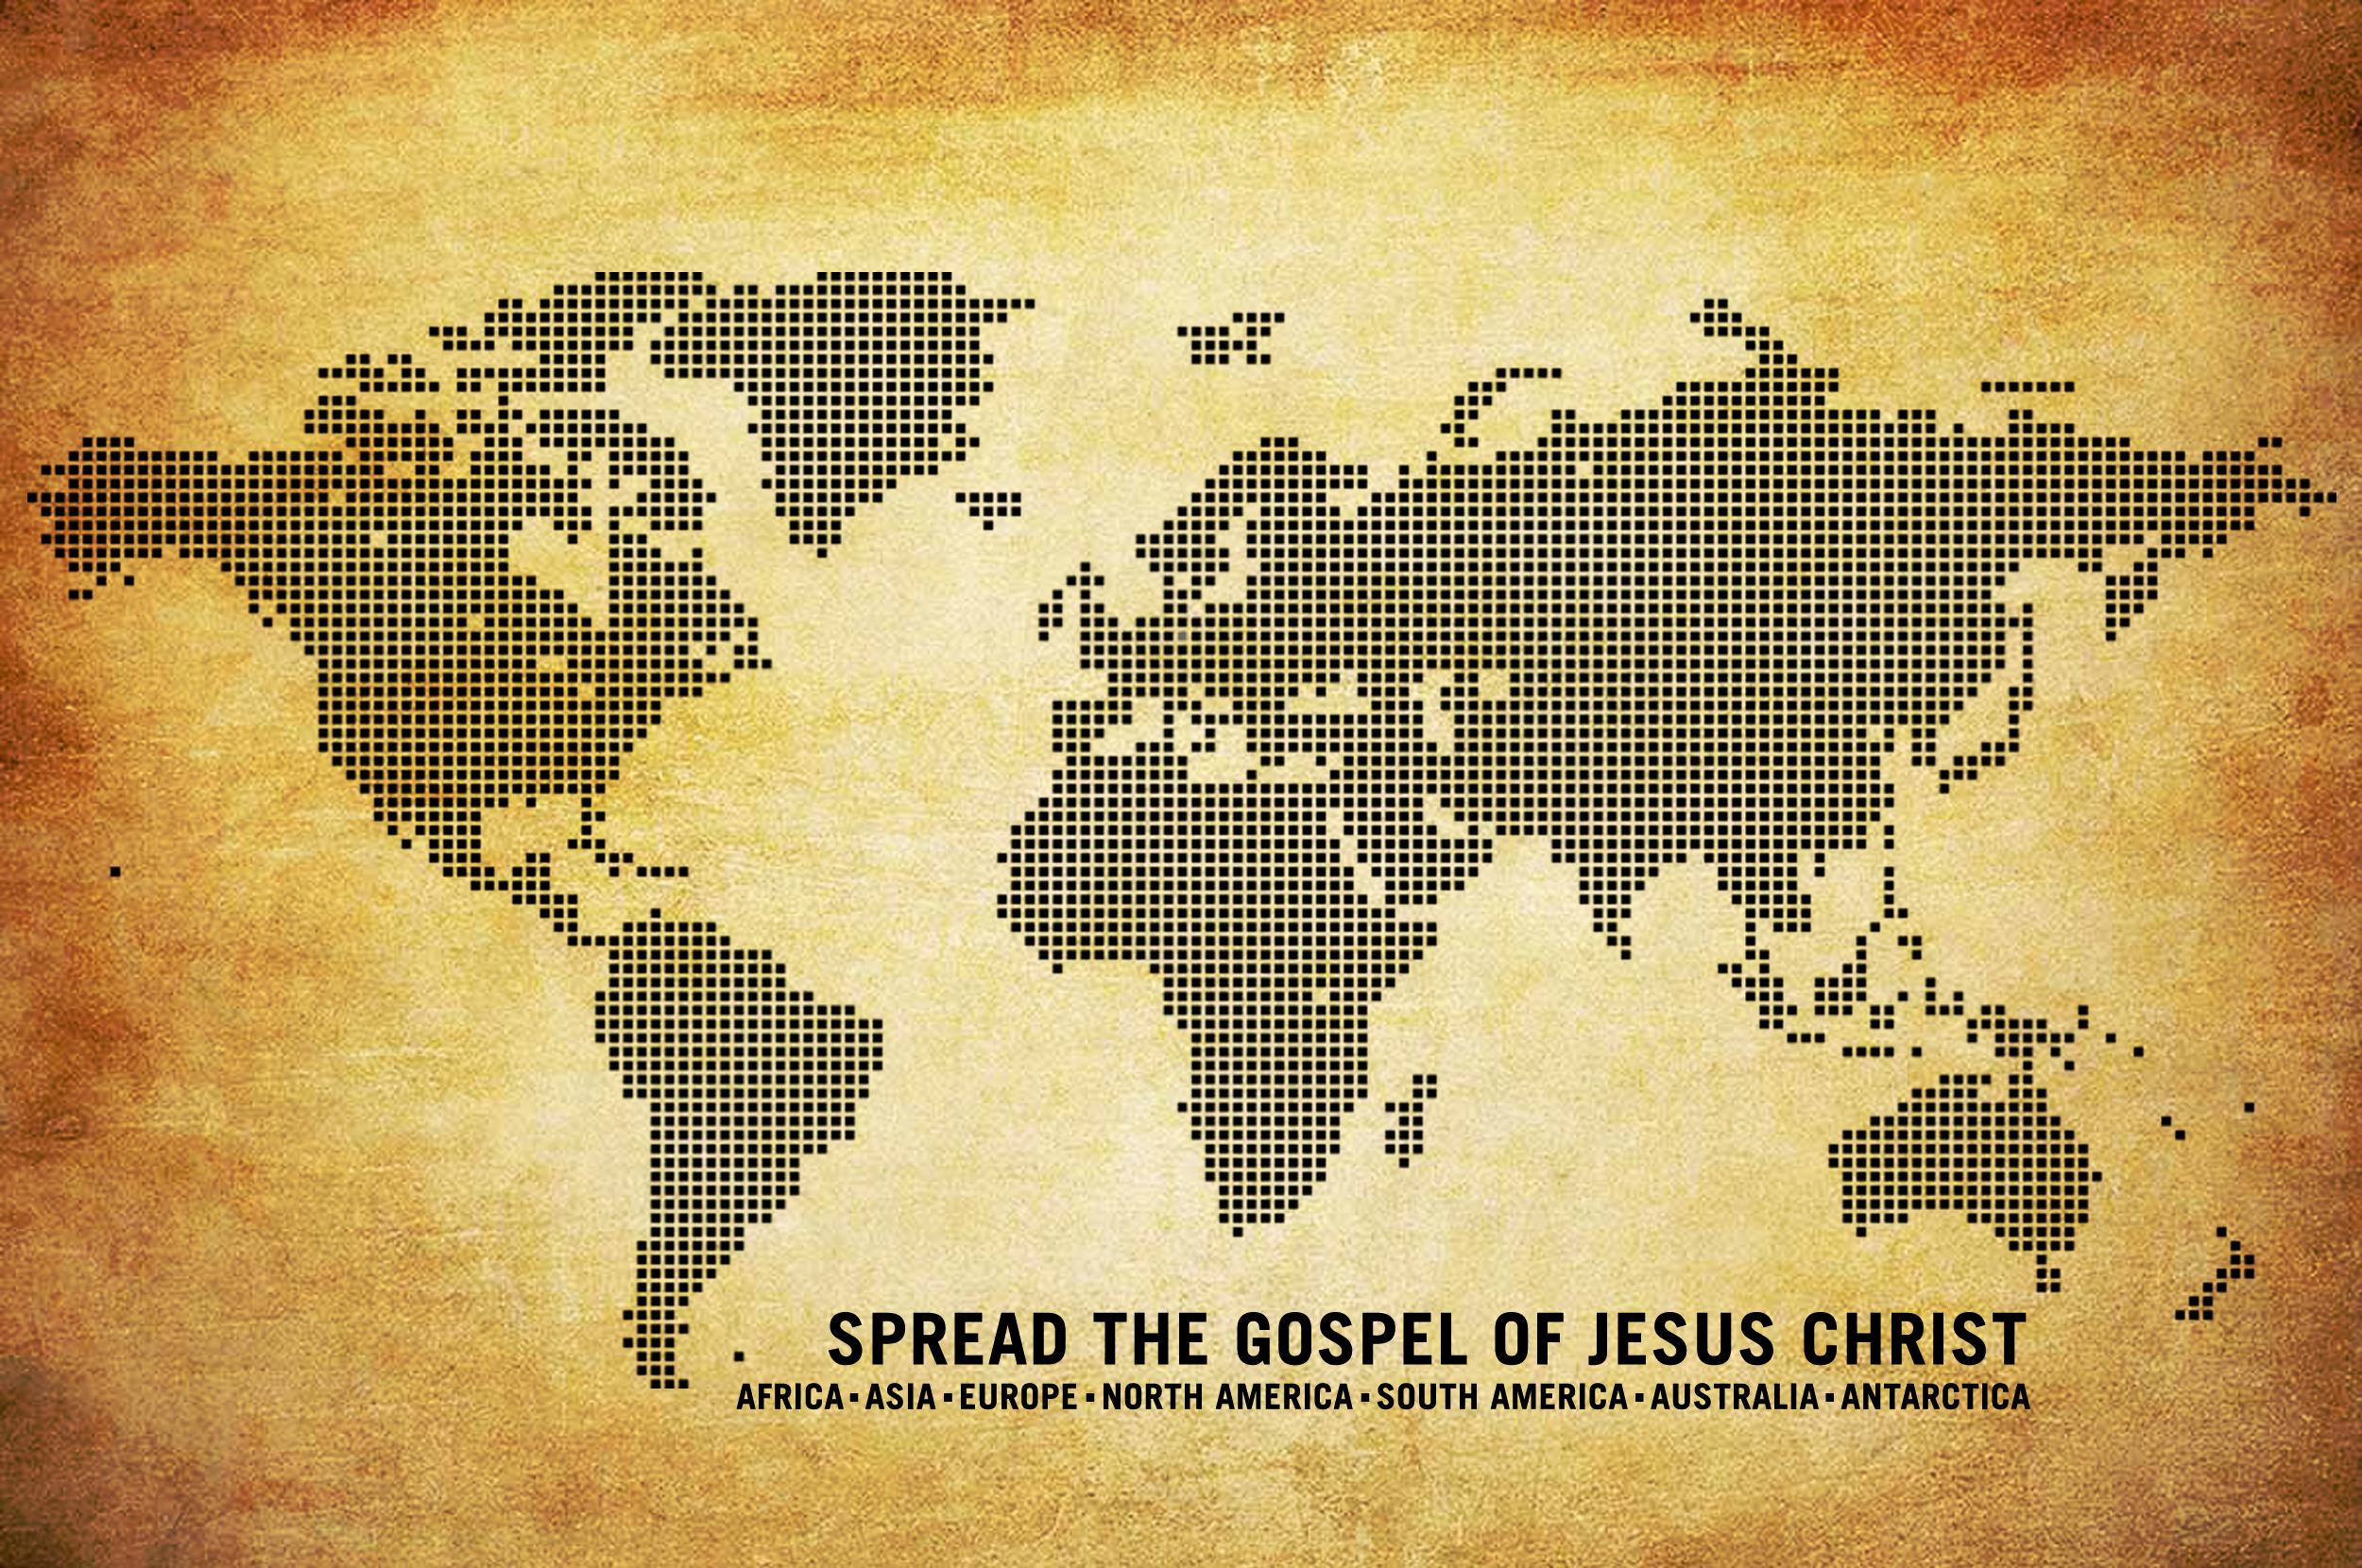 Bachelor of Evangelism – Freedom Bible College & Seminary